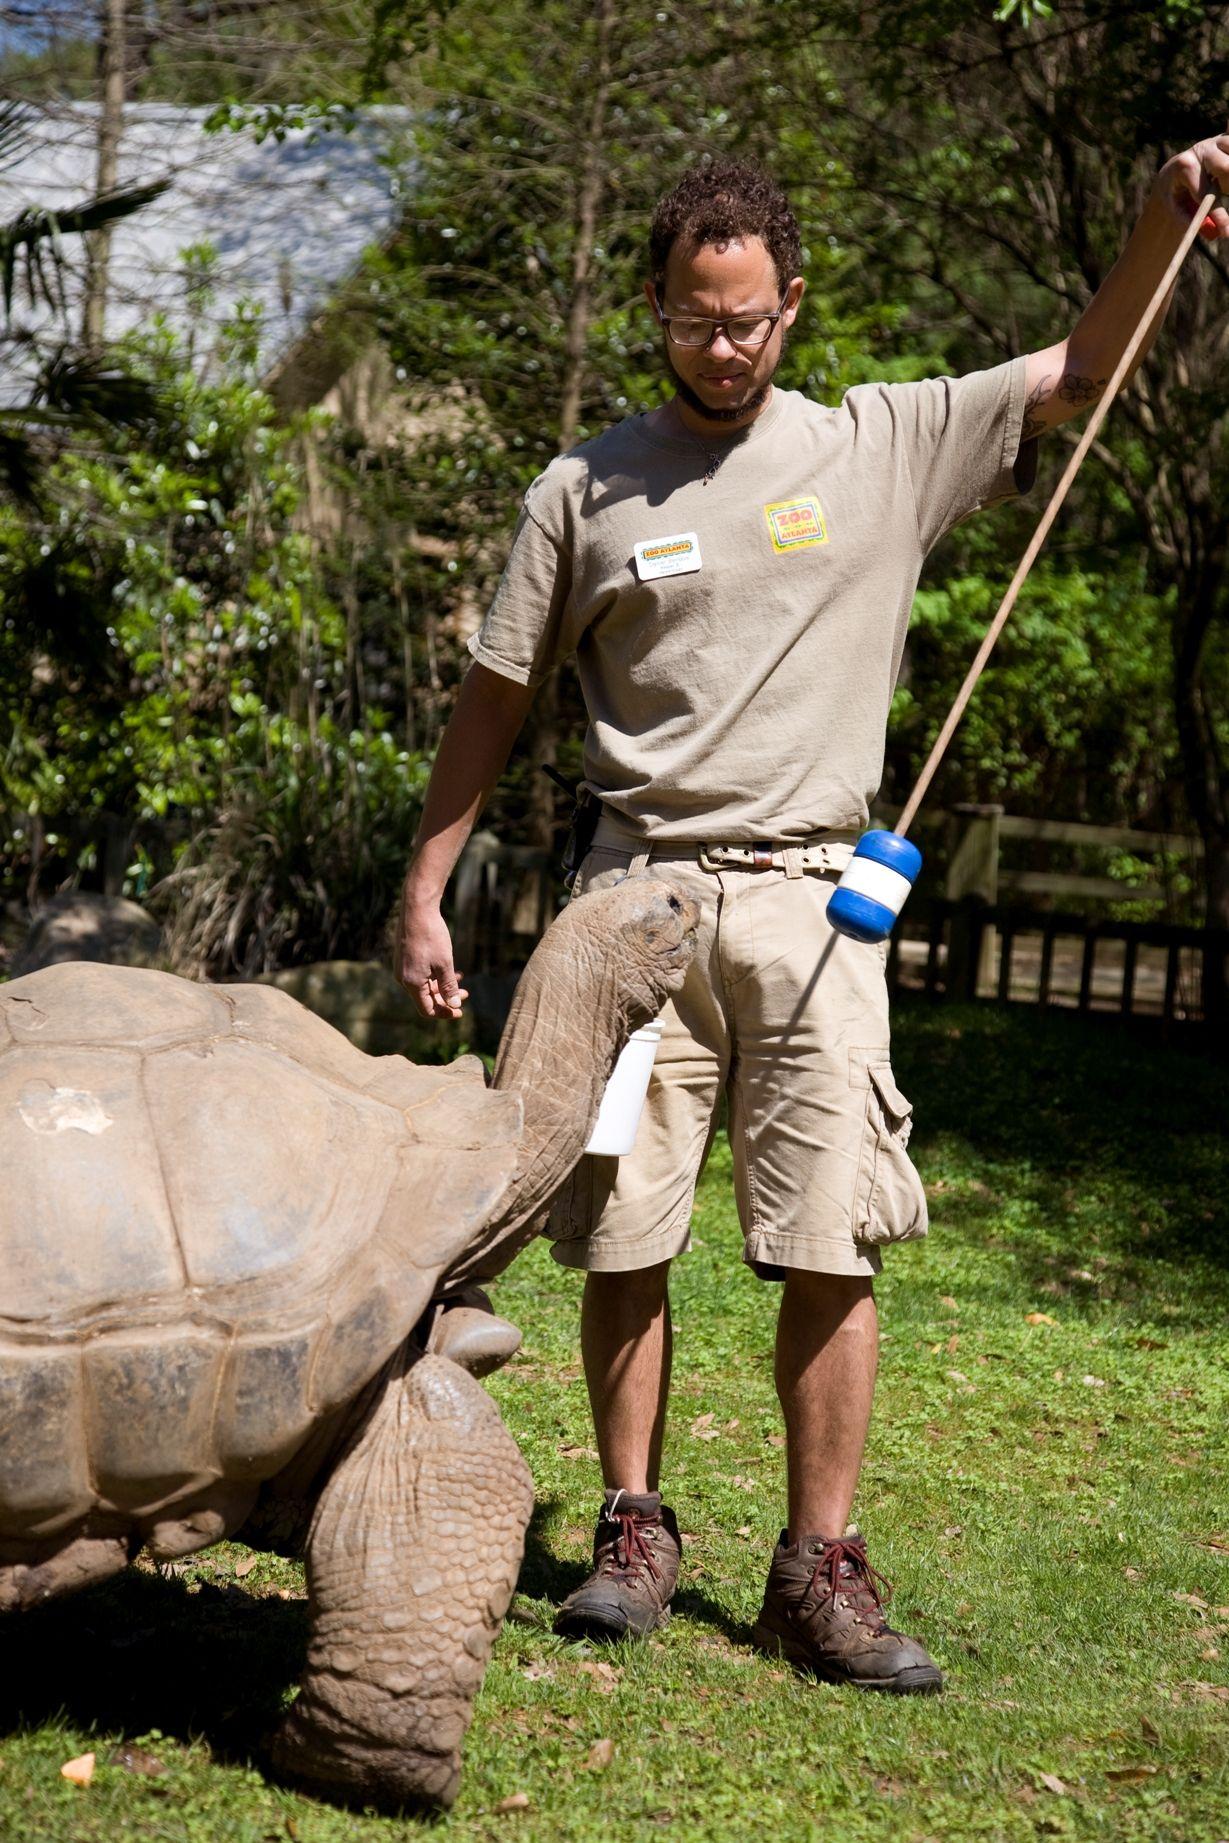 Danny Works On Aldabra Tortoise Training The Target Pole